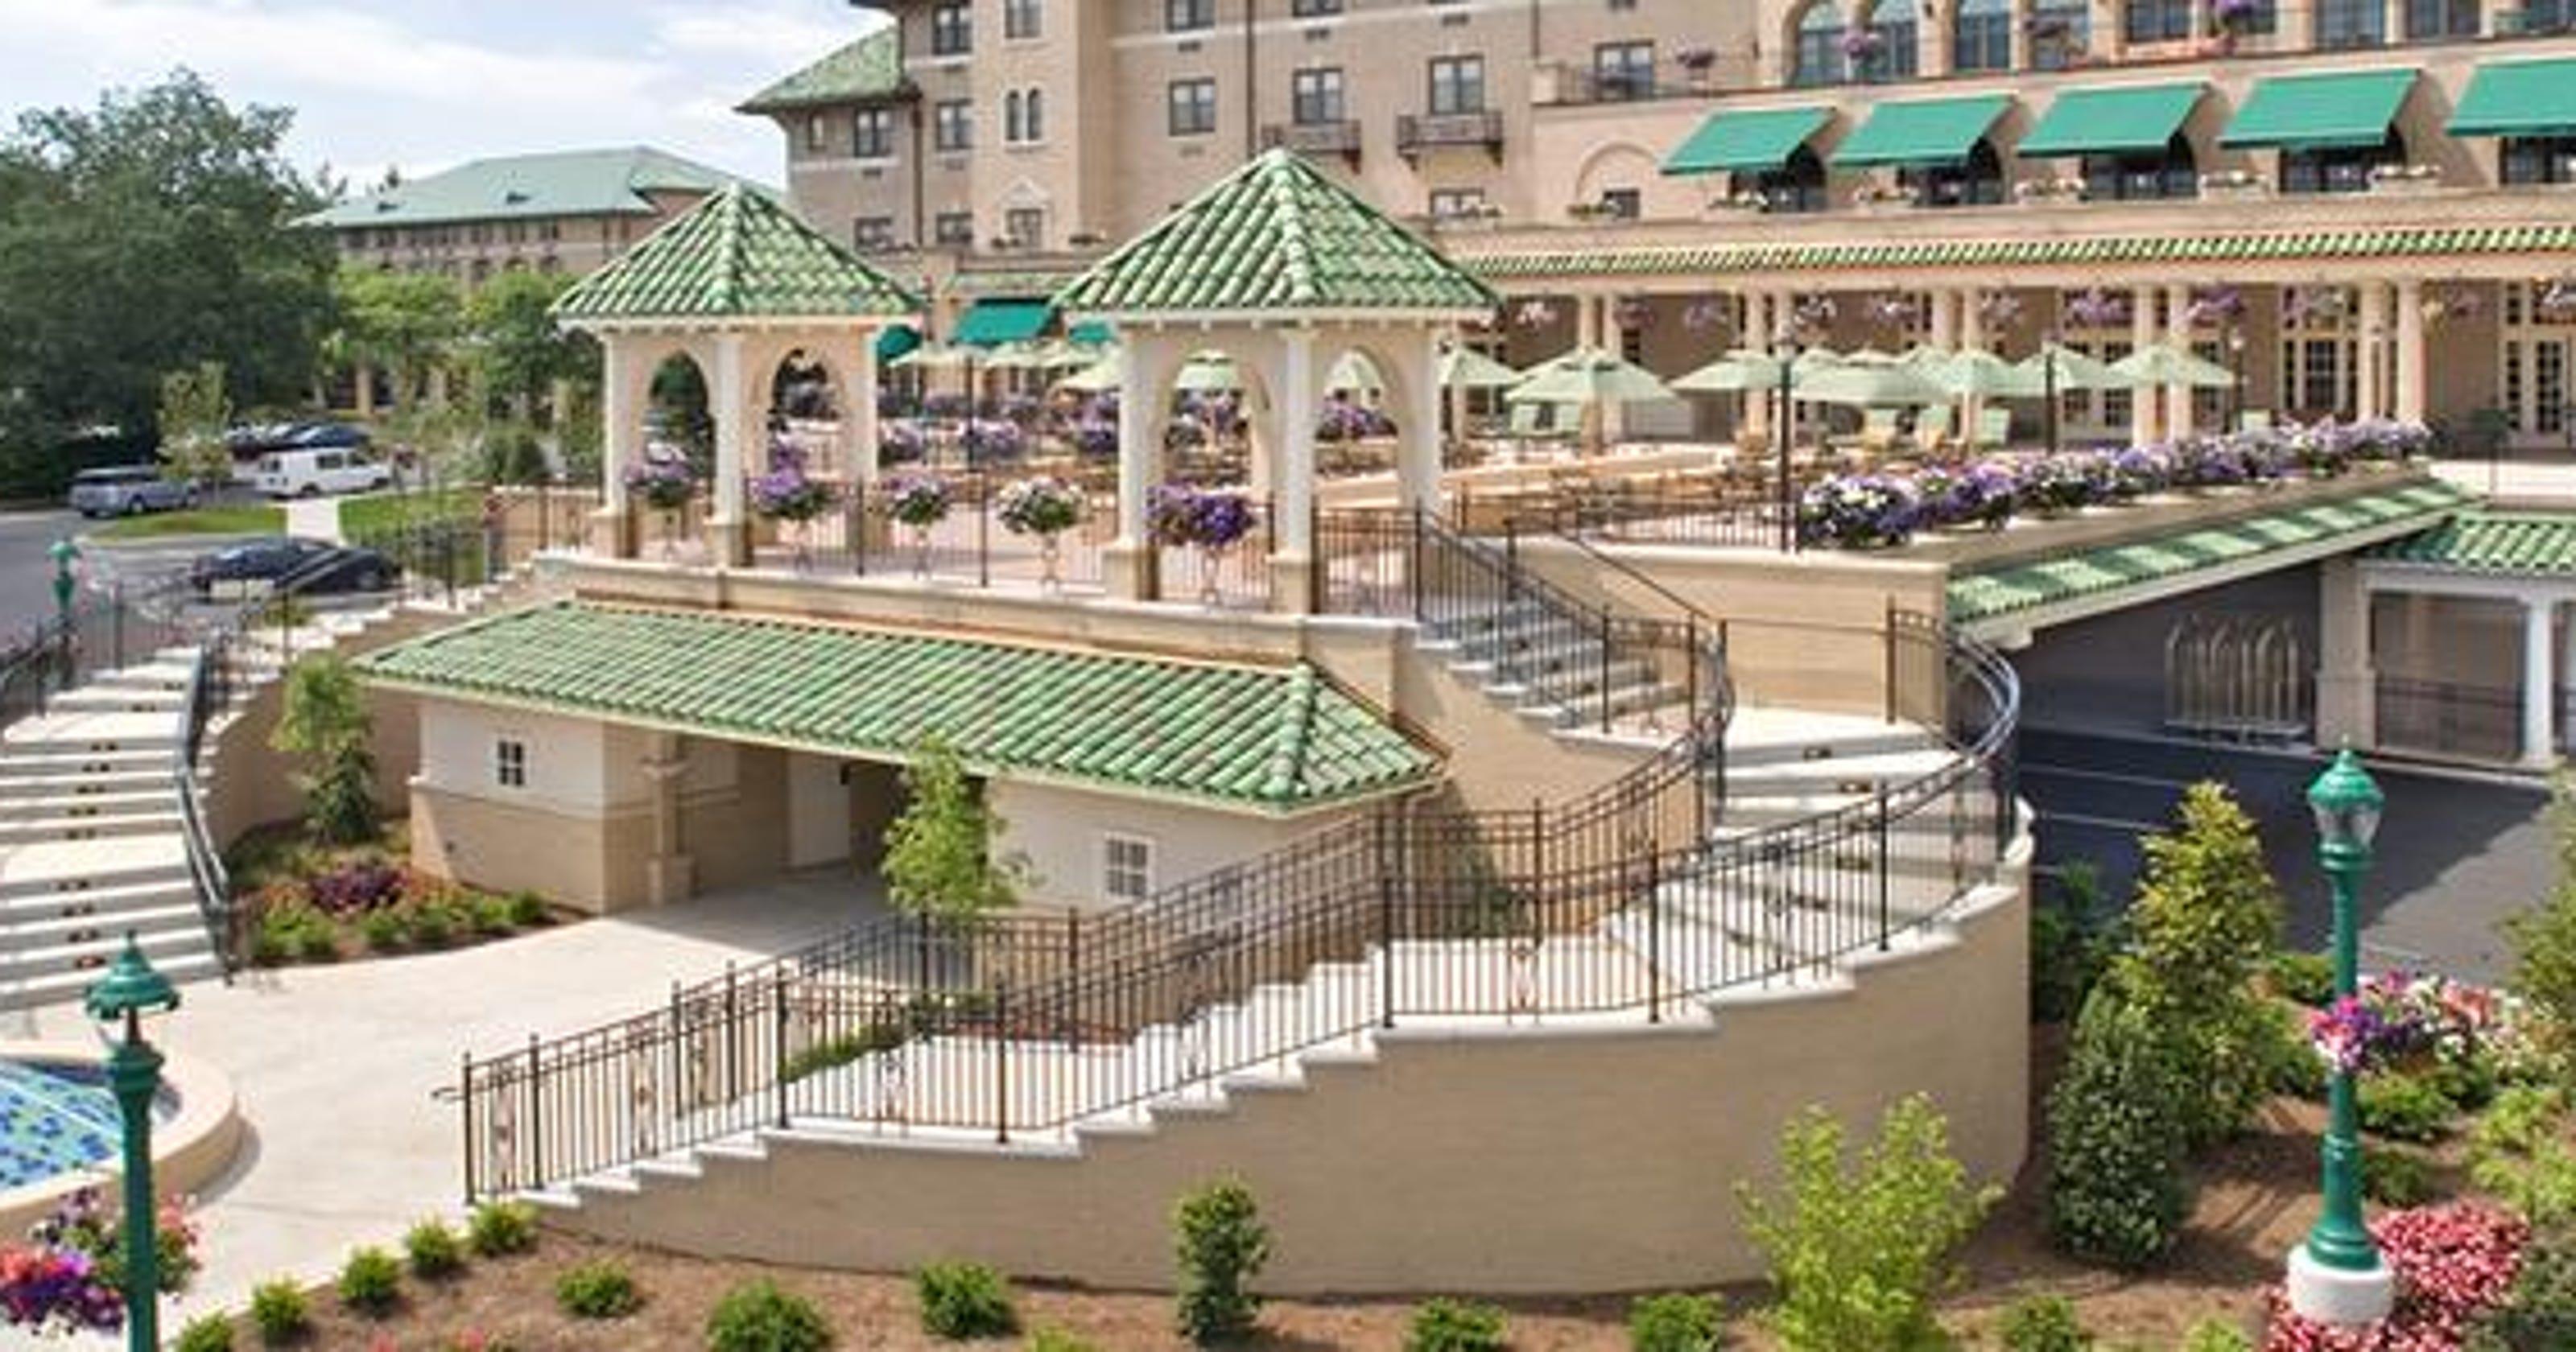 Hersheypark Resorts Cater To Every Taste